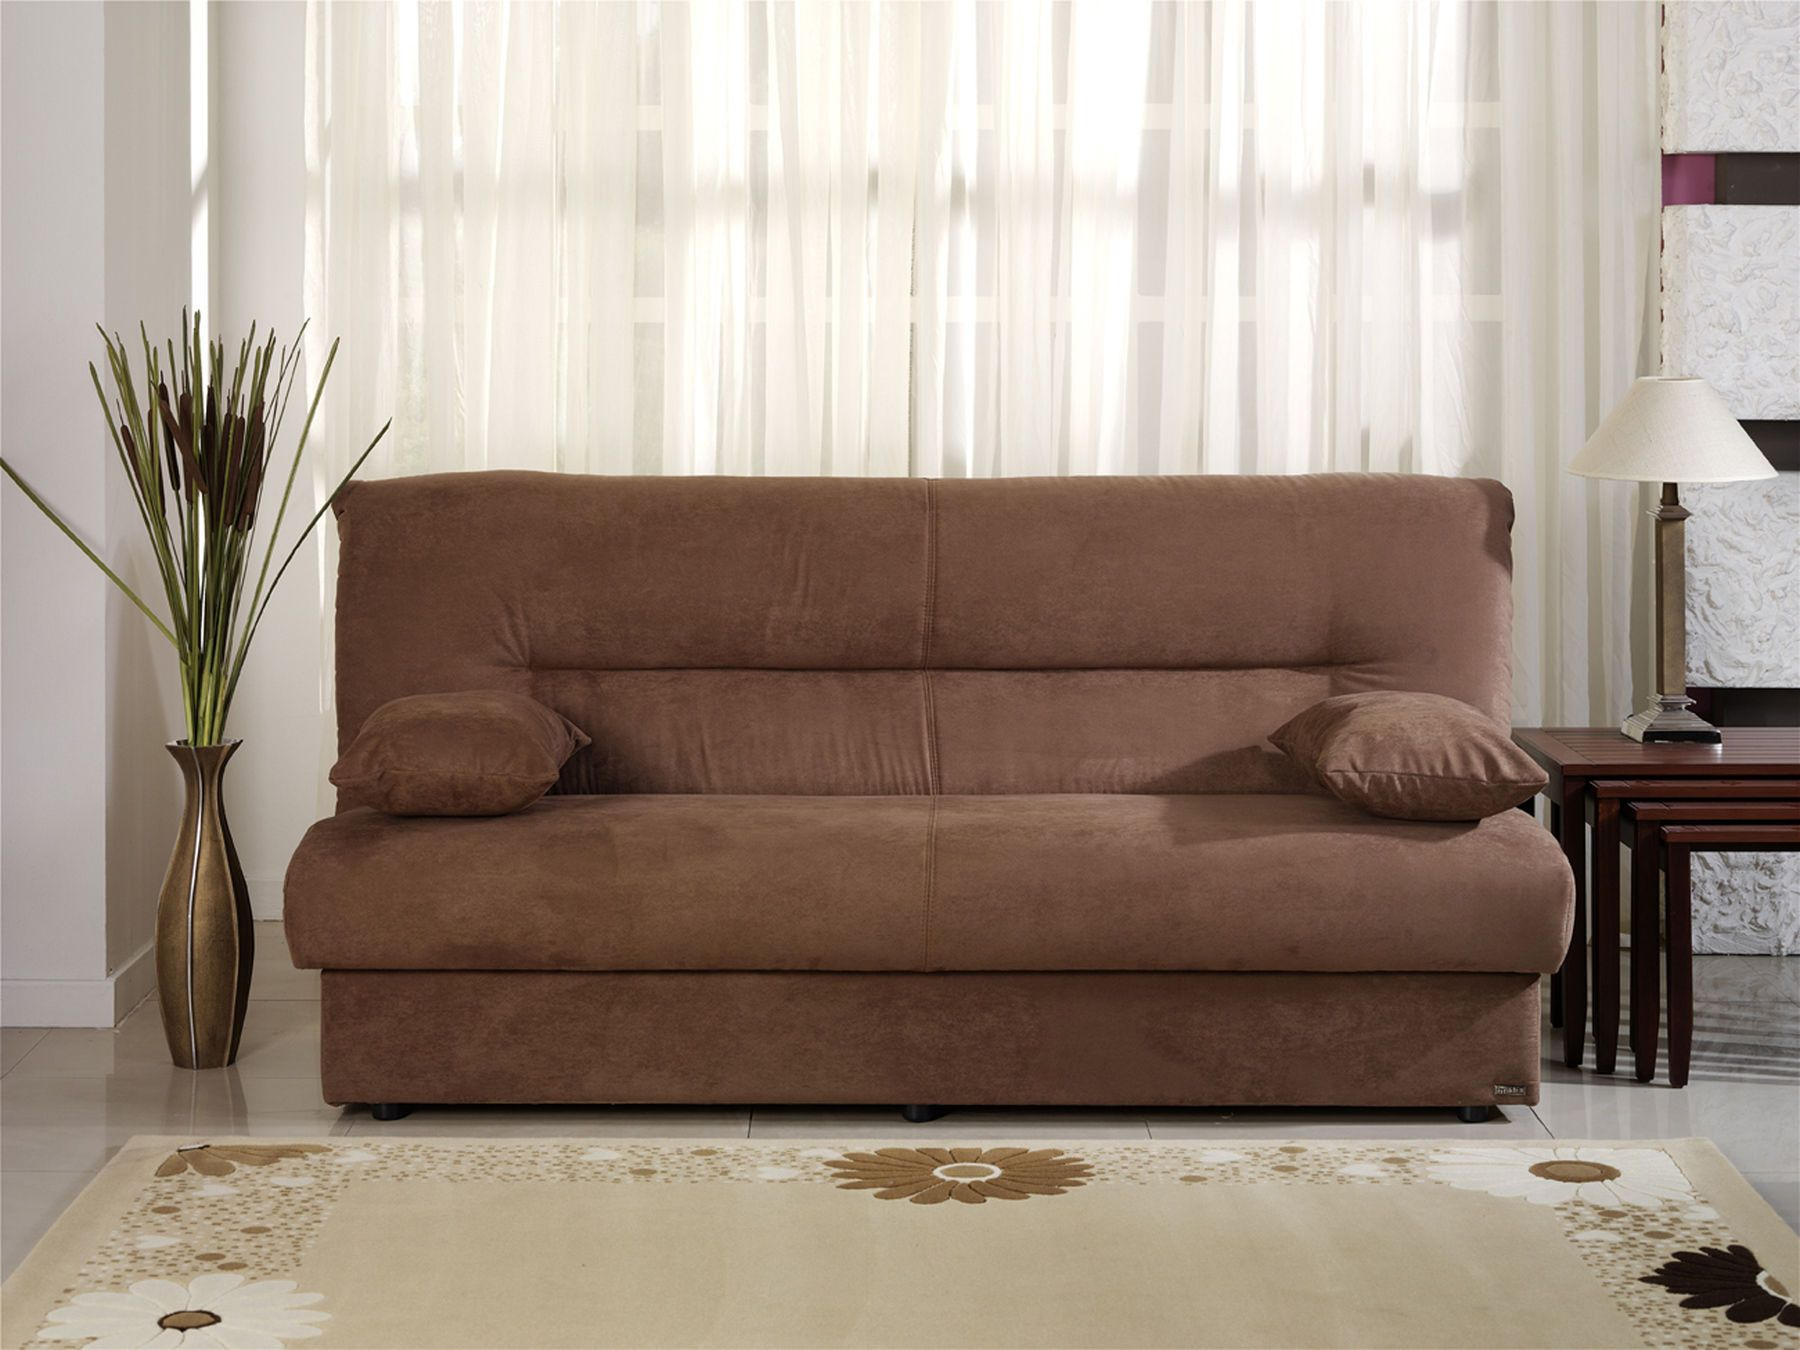 - Regata Truffle Sofa Bed In 2020 Brown Fabric Sofa, Sofa Bed With